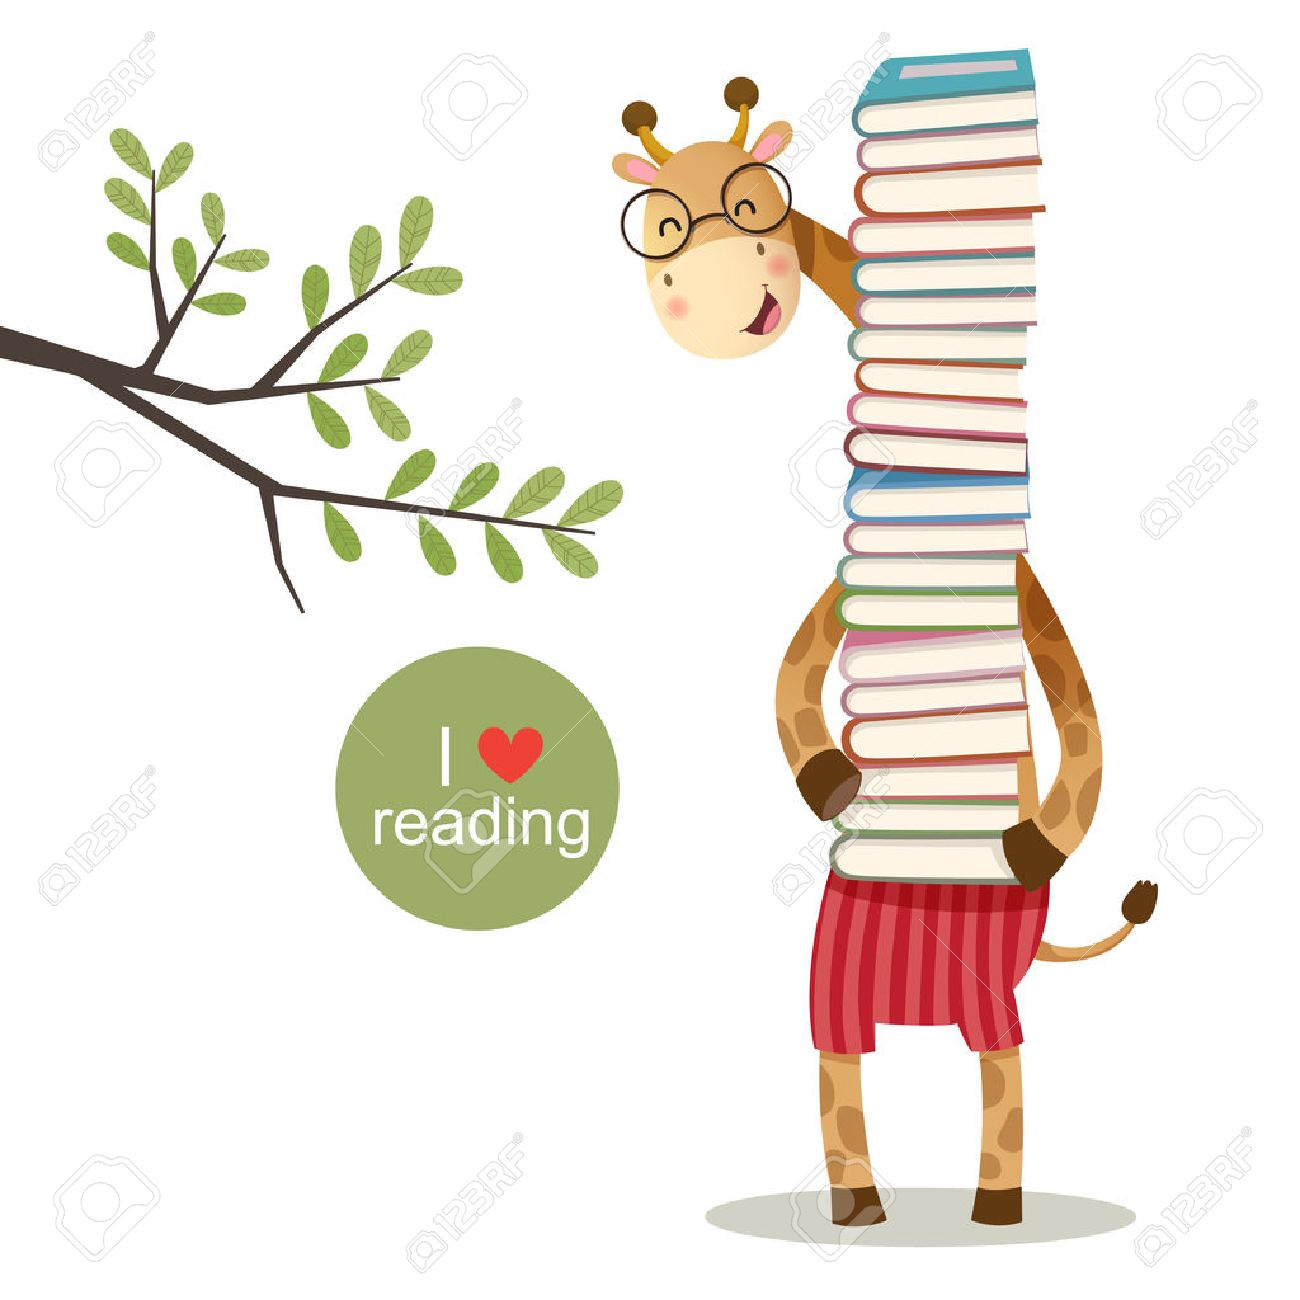 illustration of cartoon giraffe holding a pile of books - 54931396